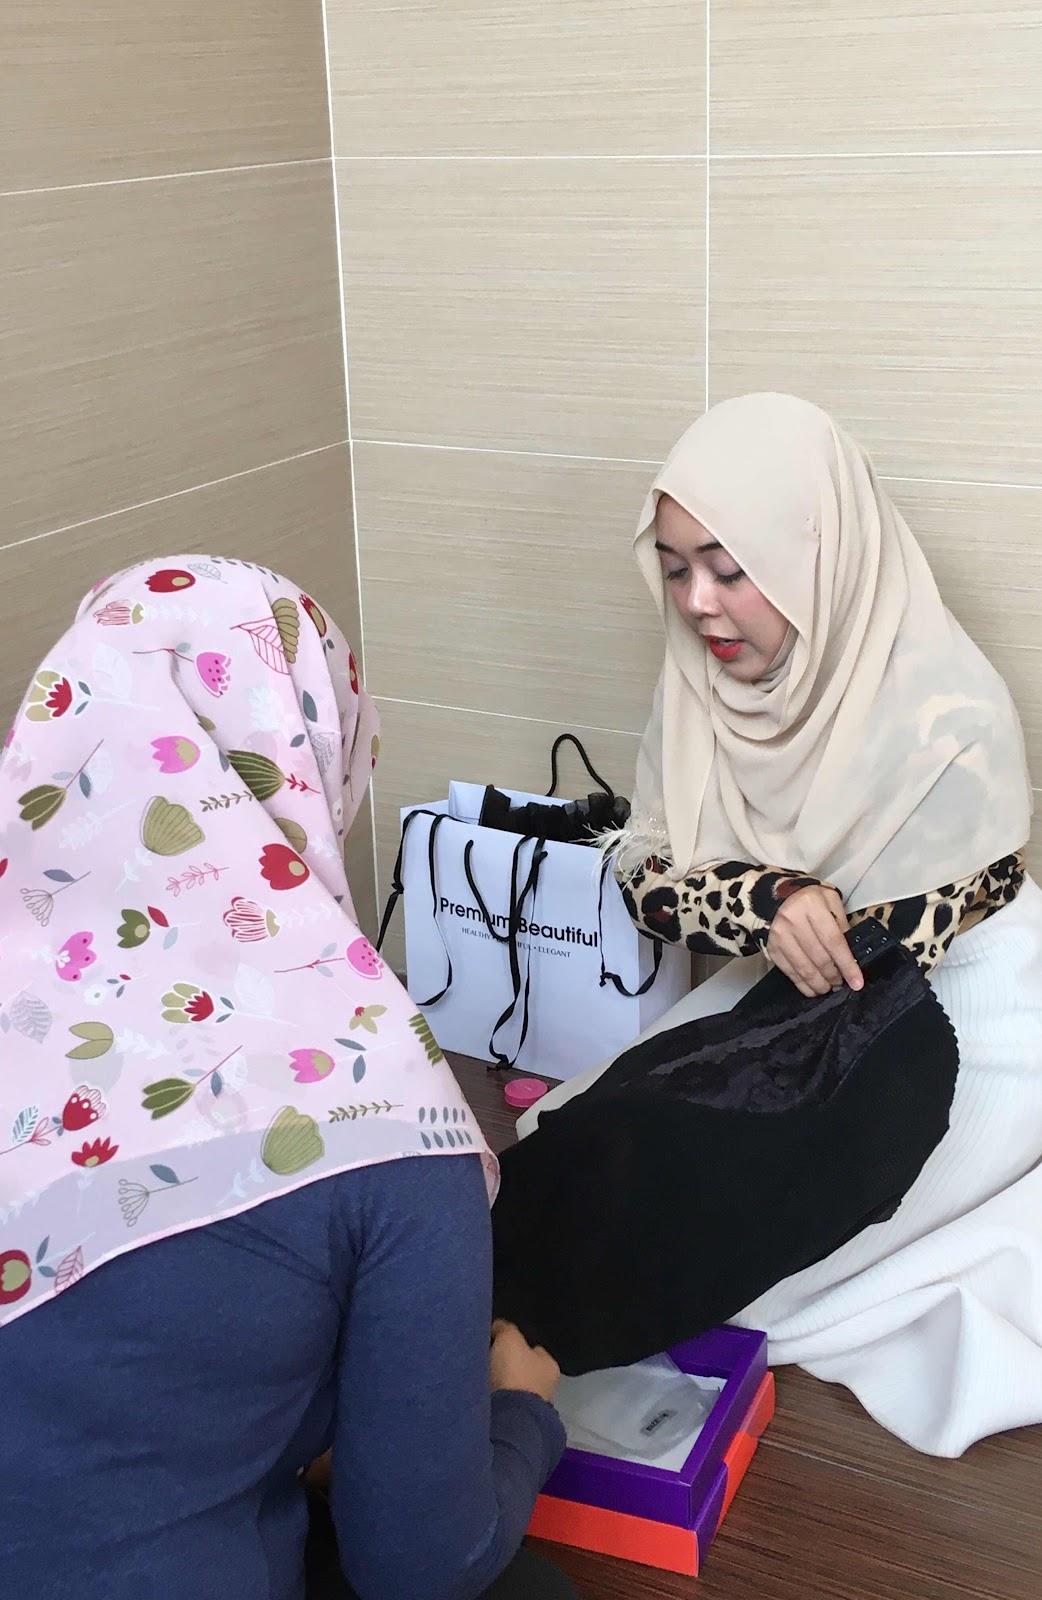 labu sayong Meru AManjaya Perak - tempat makan best di Ipoh - Premium Beautiful Therapants Perak